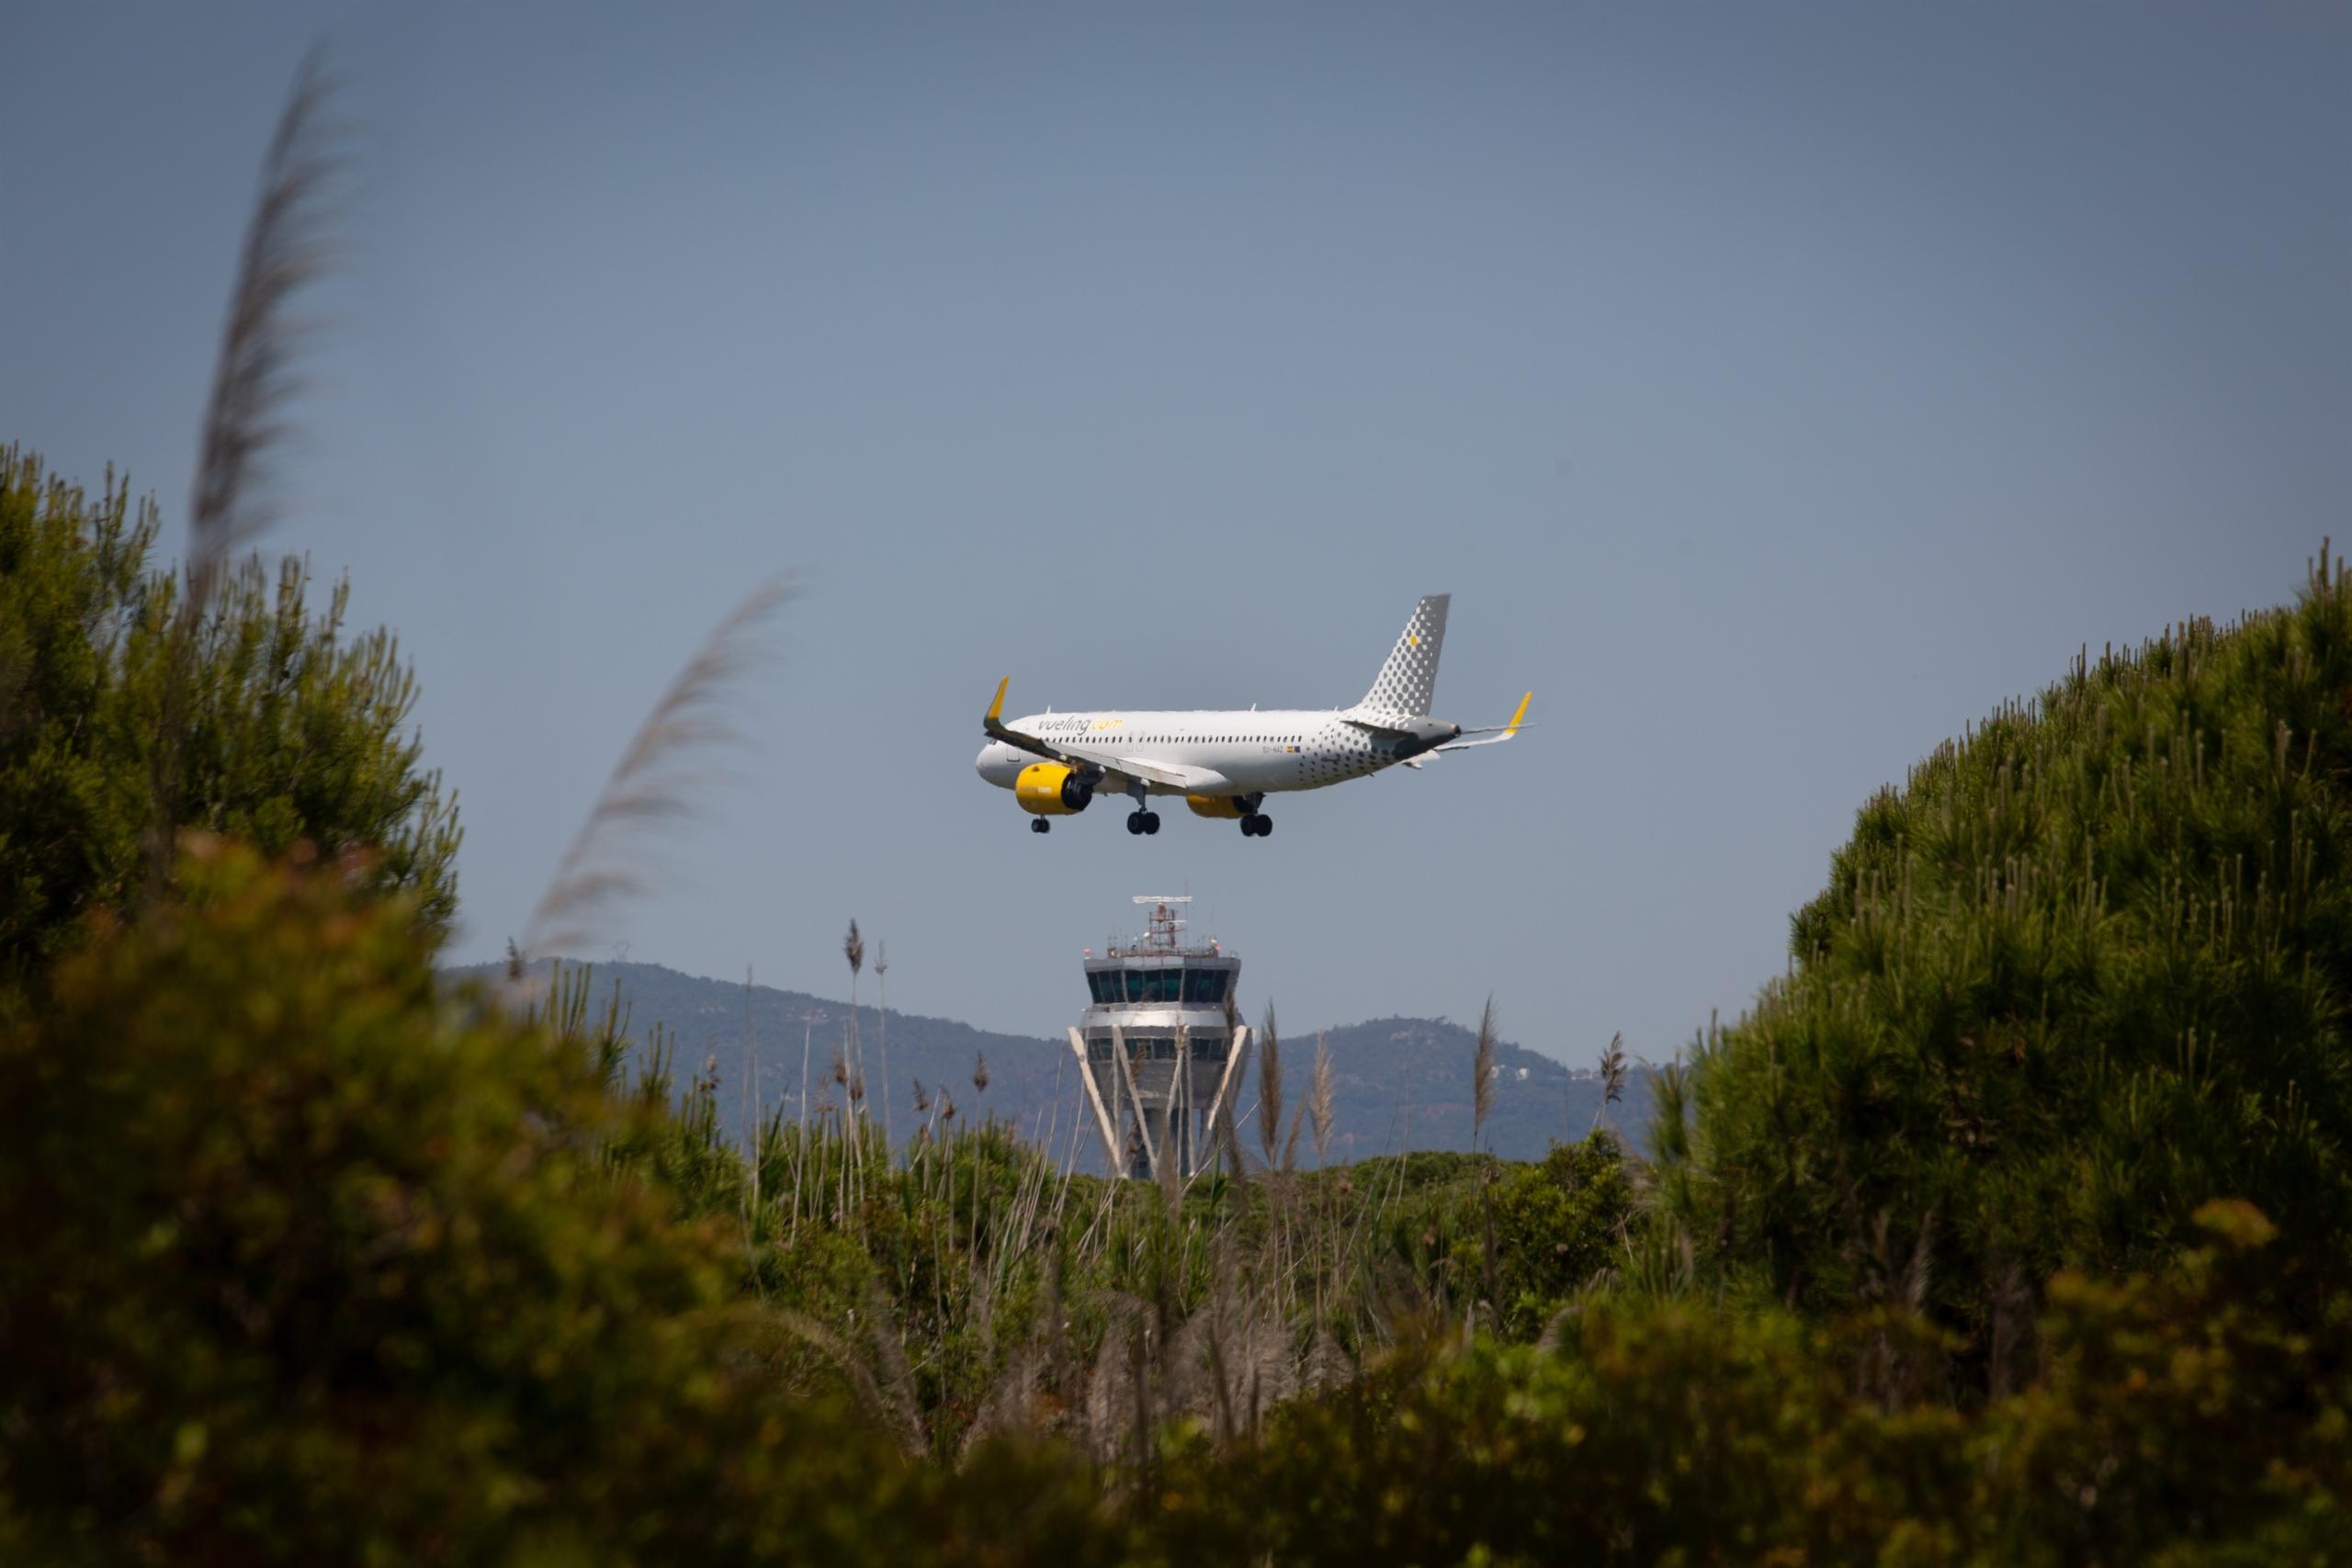 Un avió sobrevola la zona de la Ricarda   Europa Press